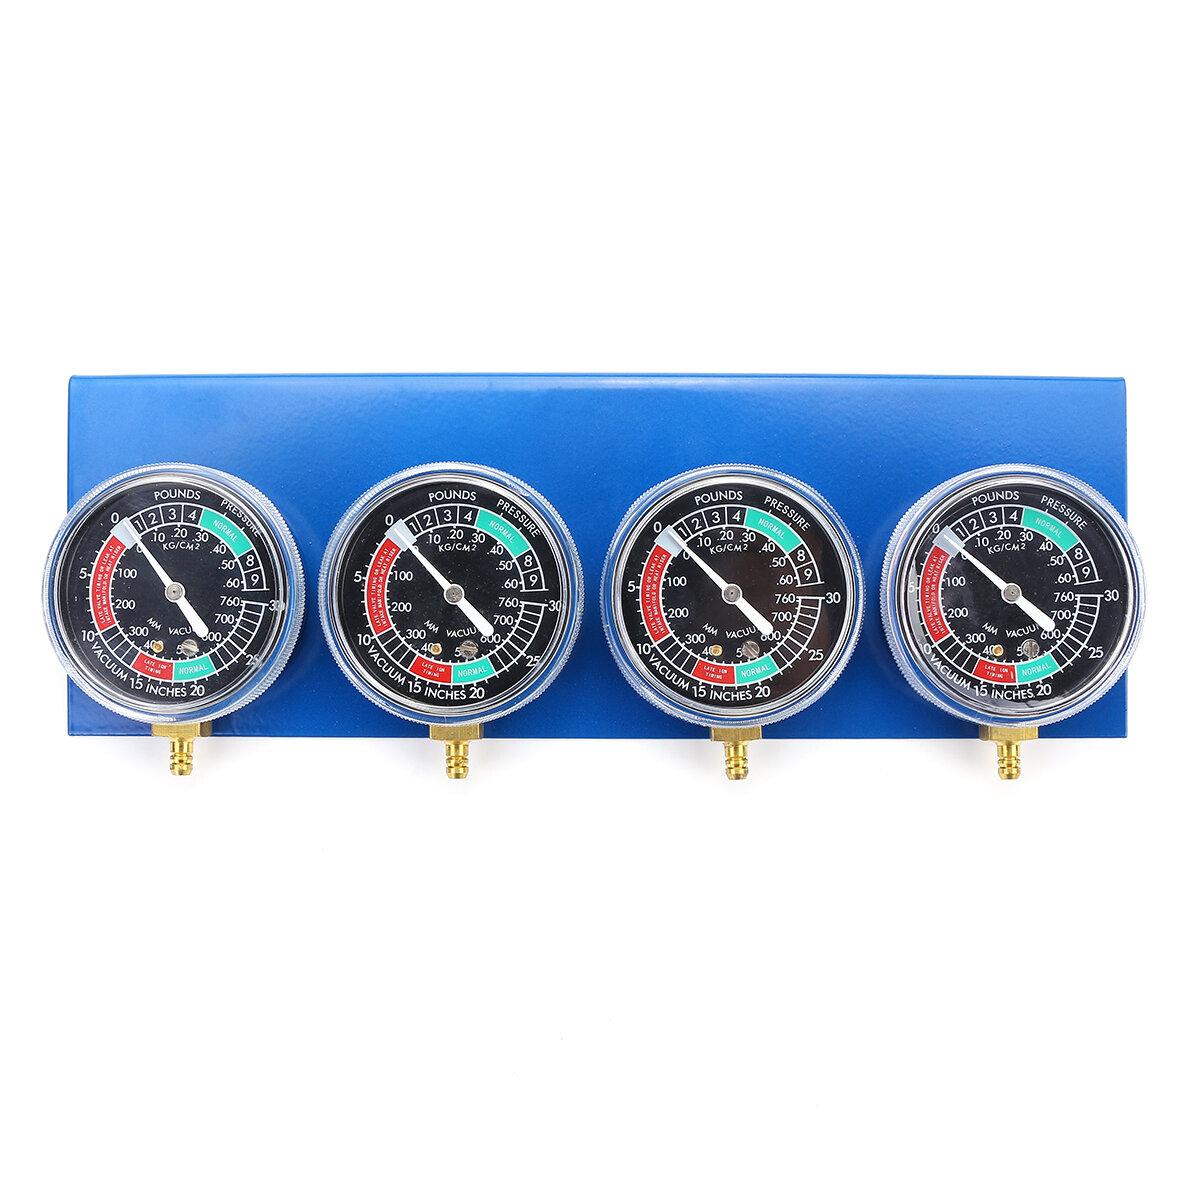 4x Motorcycle Carburetor Carb Fuel Vacuum 2/4 Cylinder Gauge Balancer Synchronizer Diagnostic Tool